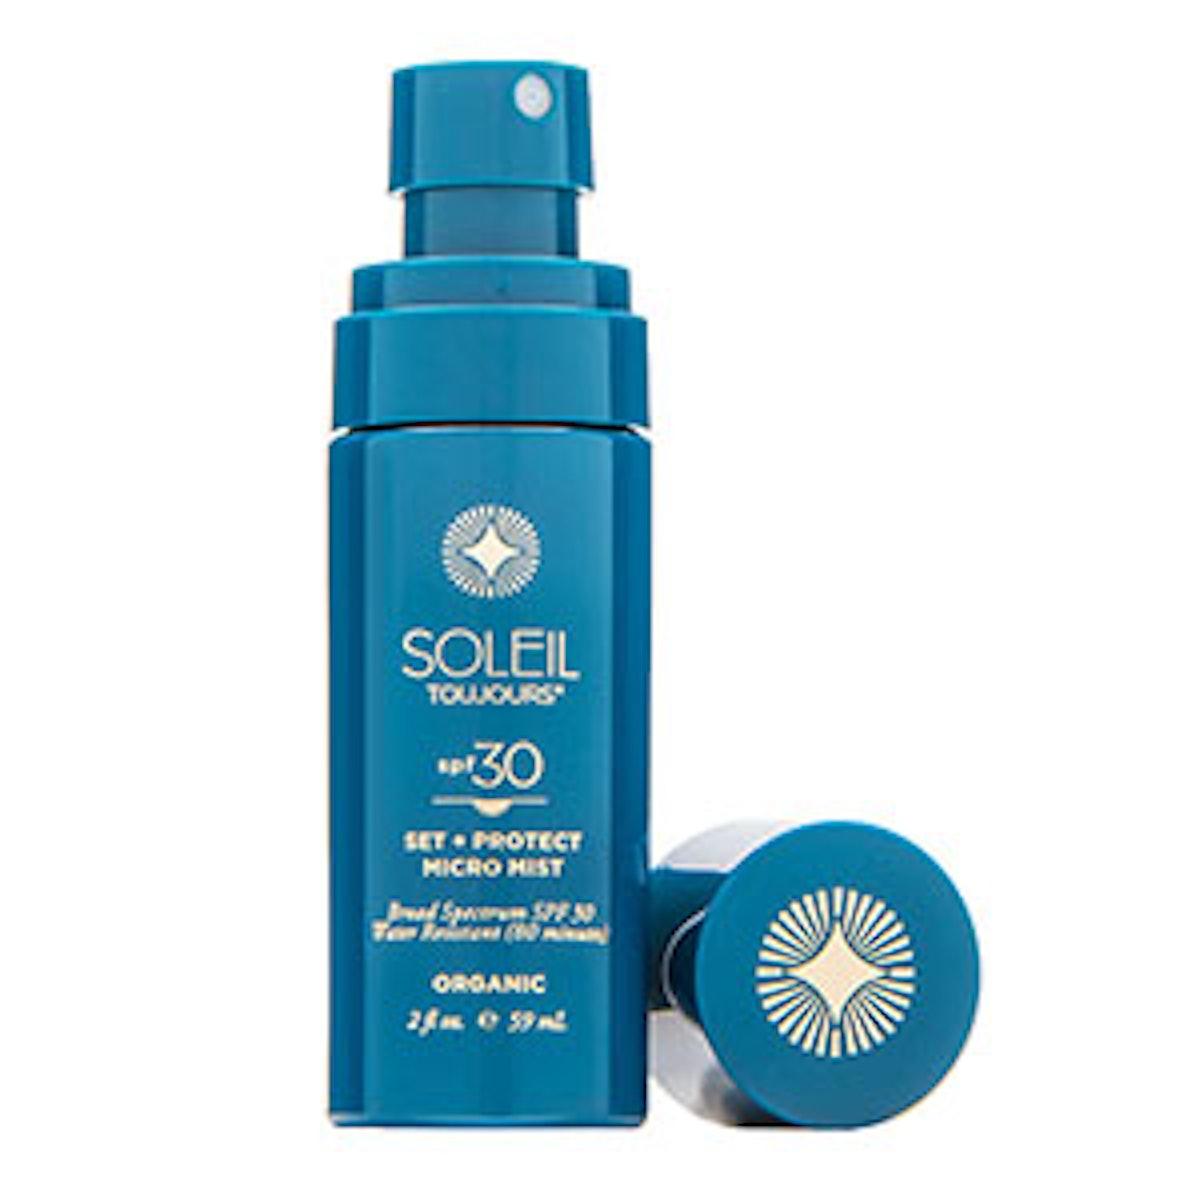 Organic Set + Protect Micro Mist SPF 30